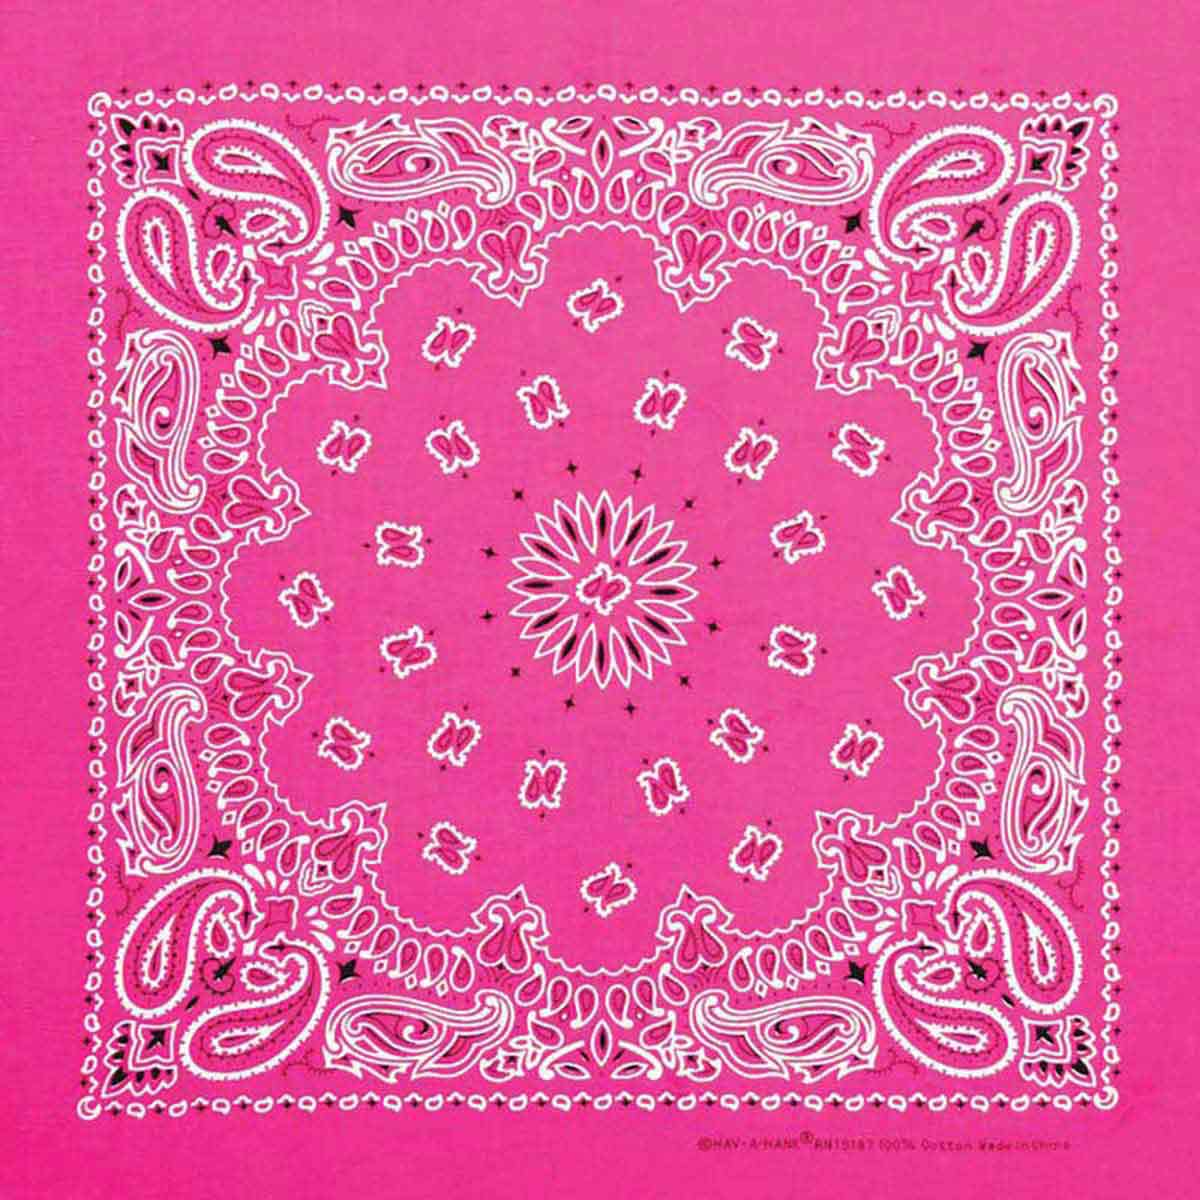 Neon Hot Pink Paisley Bandanna for Dog Grooming available at Ryan's Pet Supplies